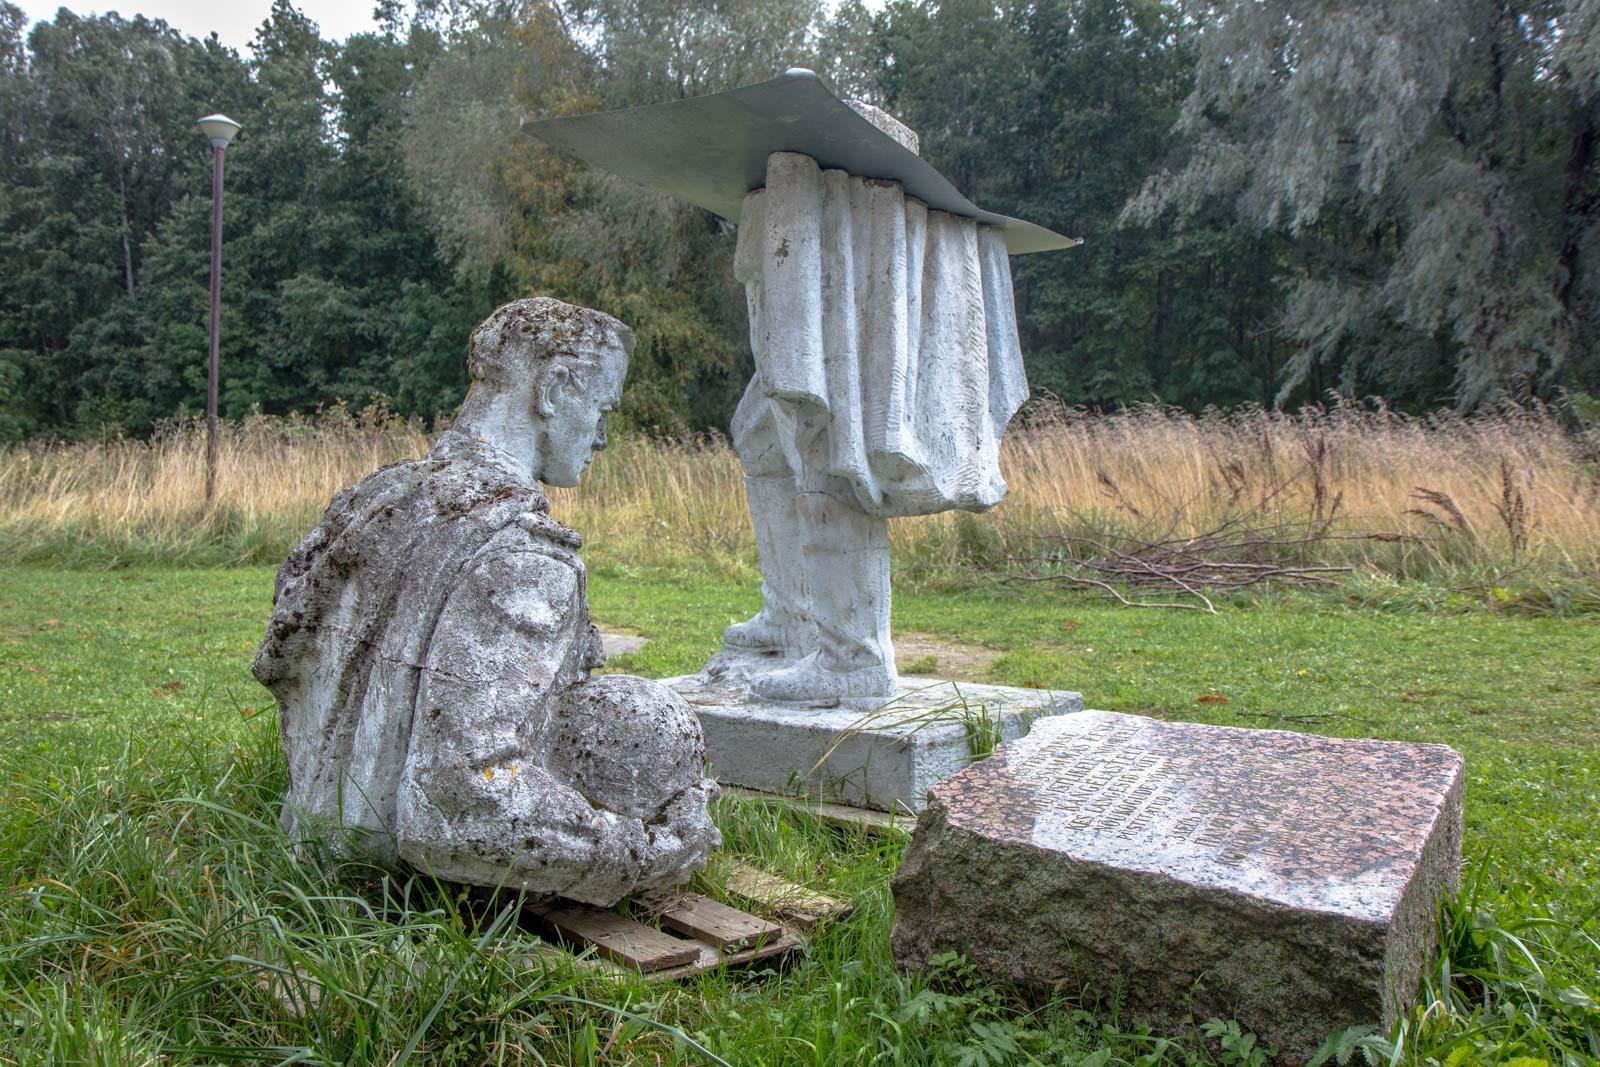 Soviet statue graveyard, Tallinn, Estonia